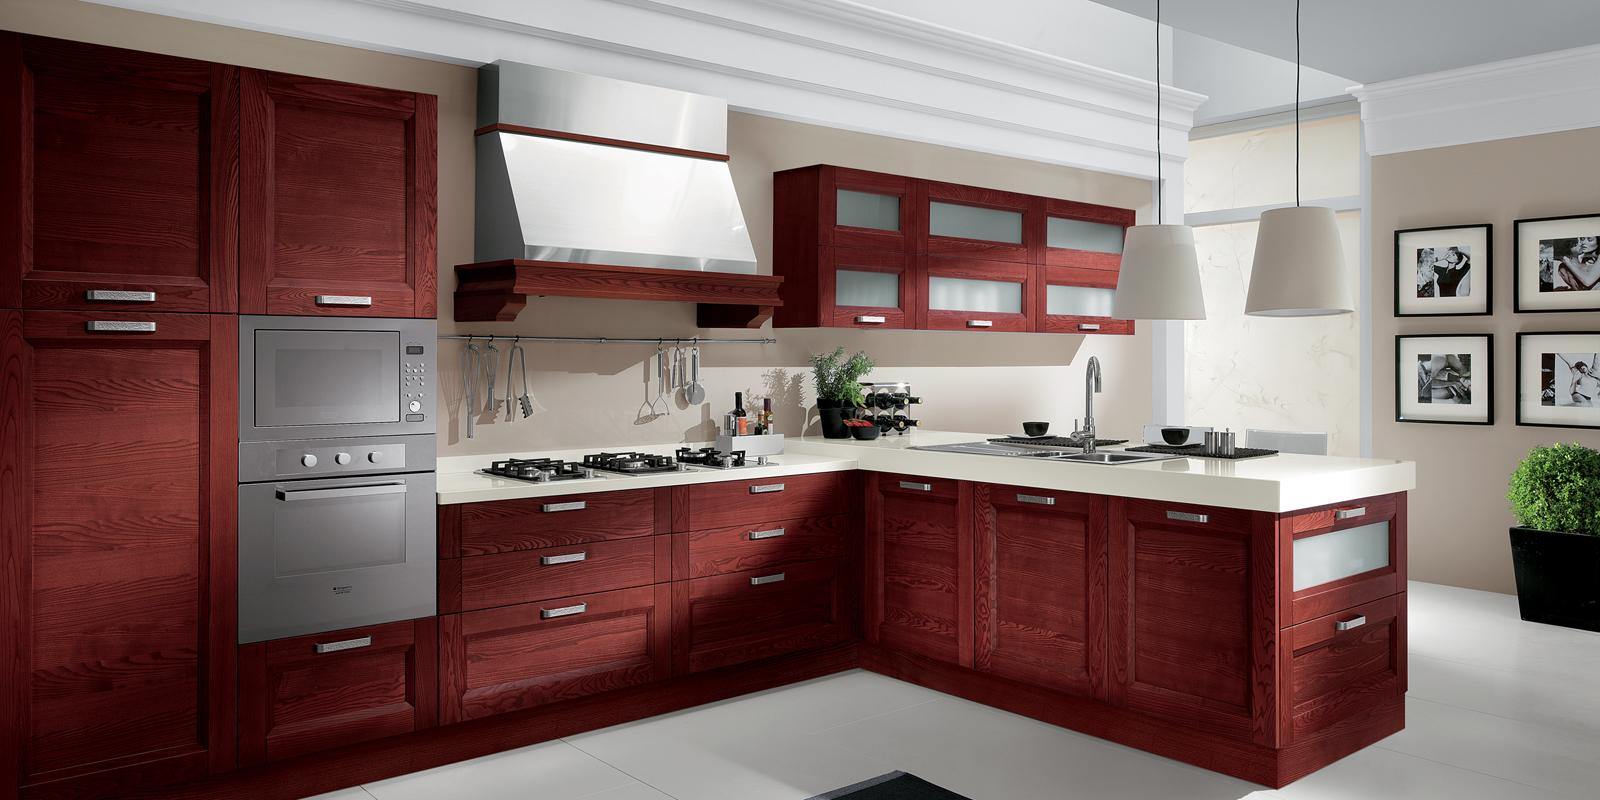 Gemal cucine - Cucine mobilturi ...